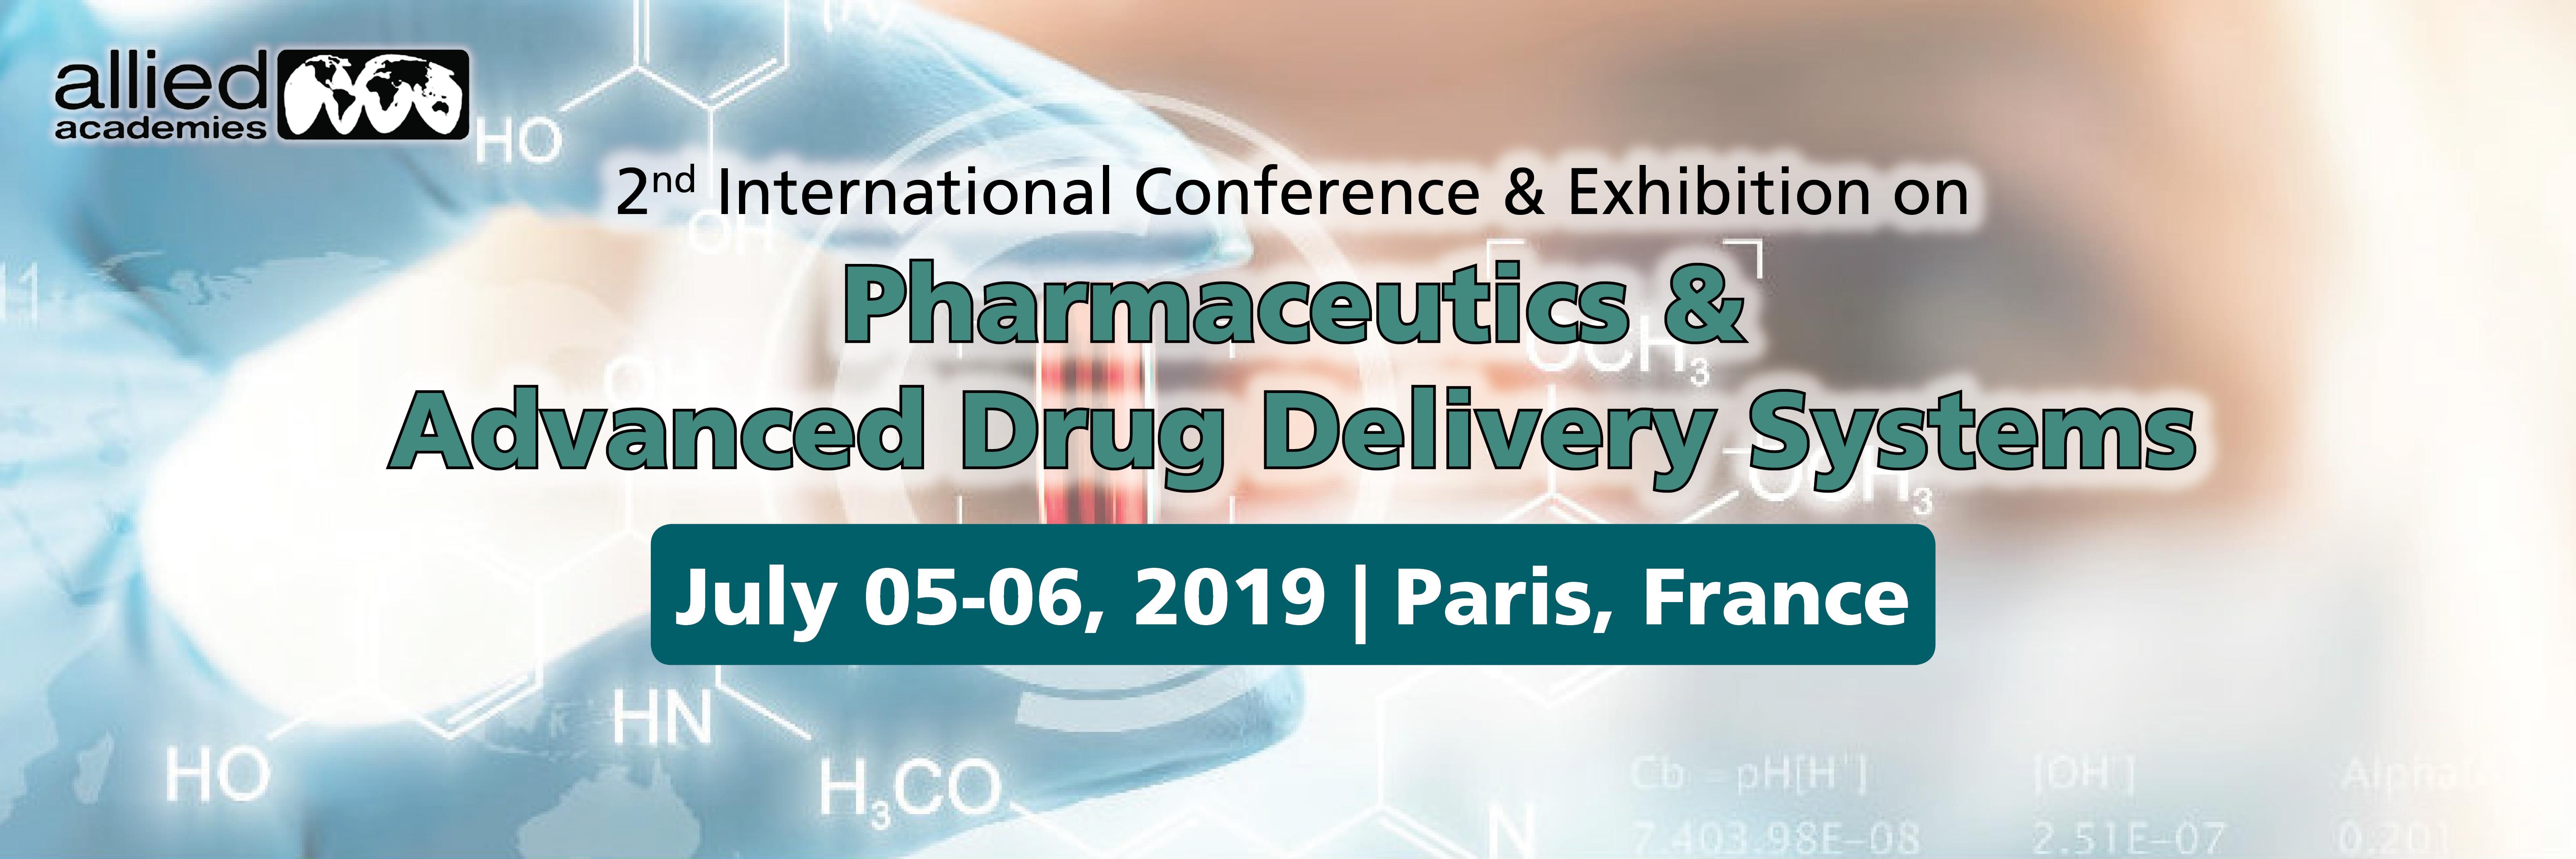 2nd World Pharma Congress 2019, Paris, France